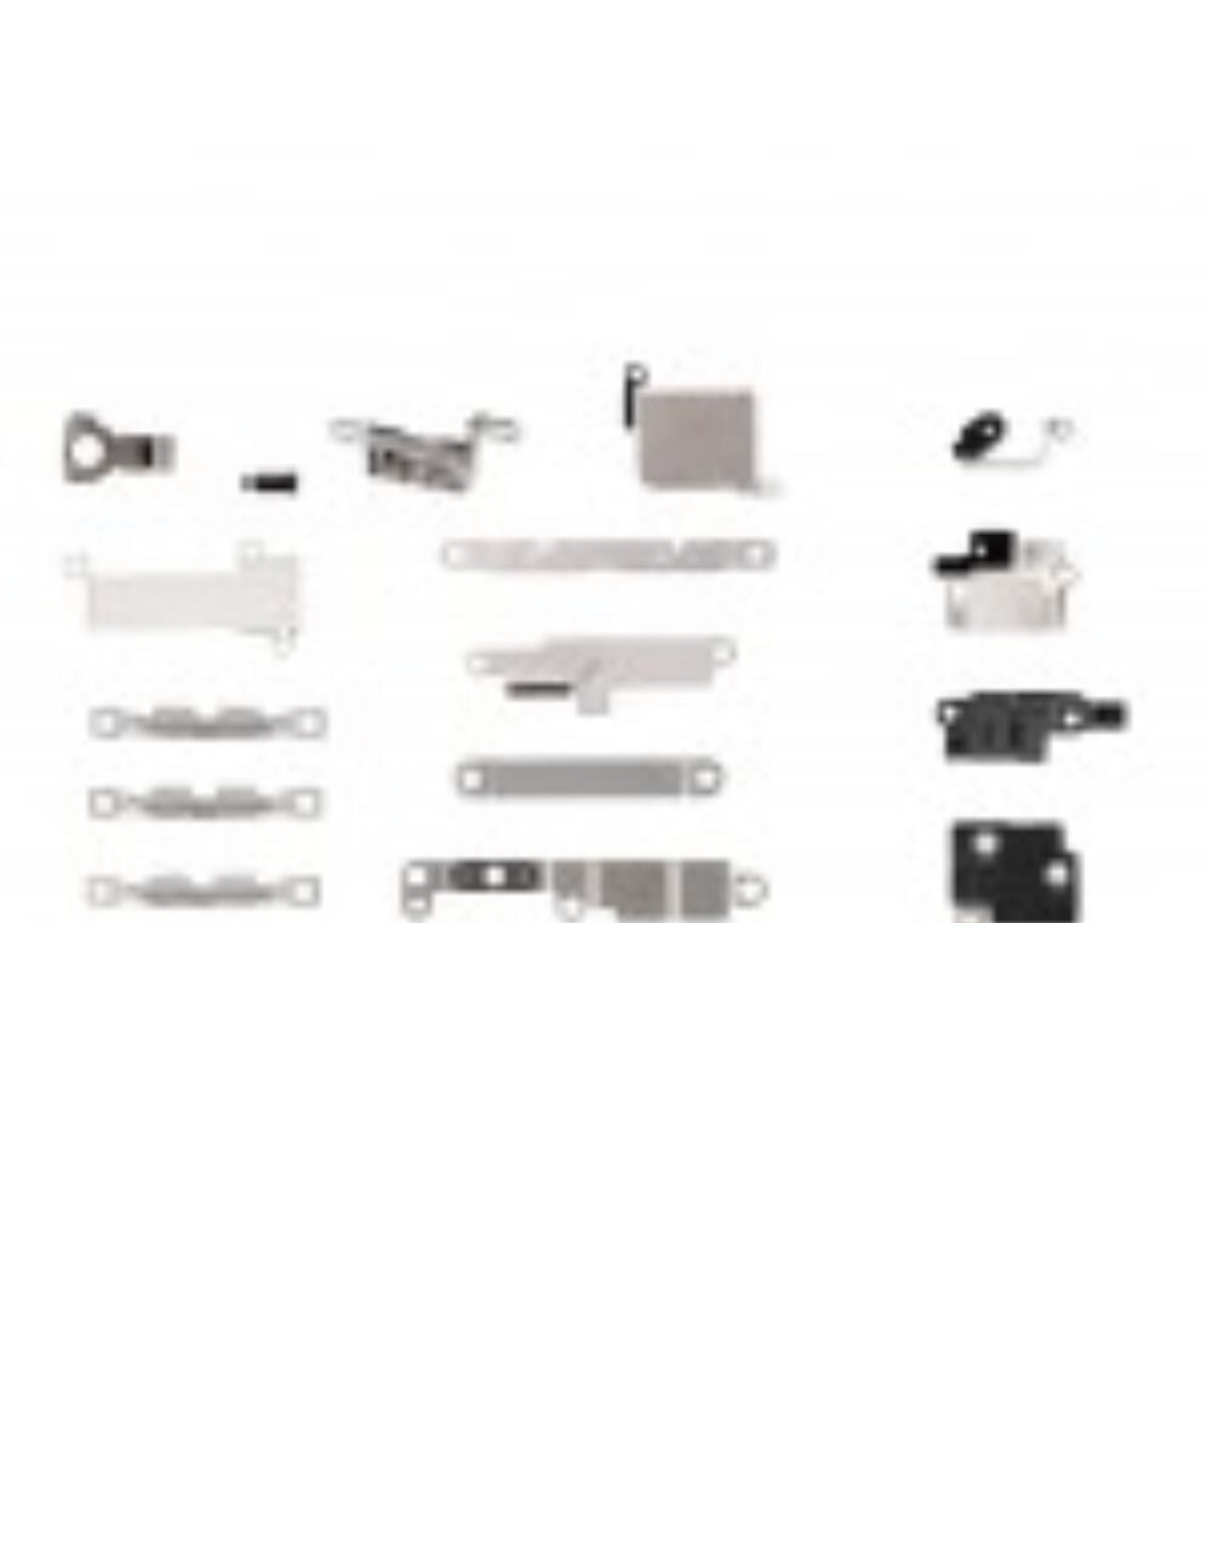 ba54a387636 Set de Partes Internas Metalicas iPhone 7 - Big Manzana